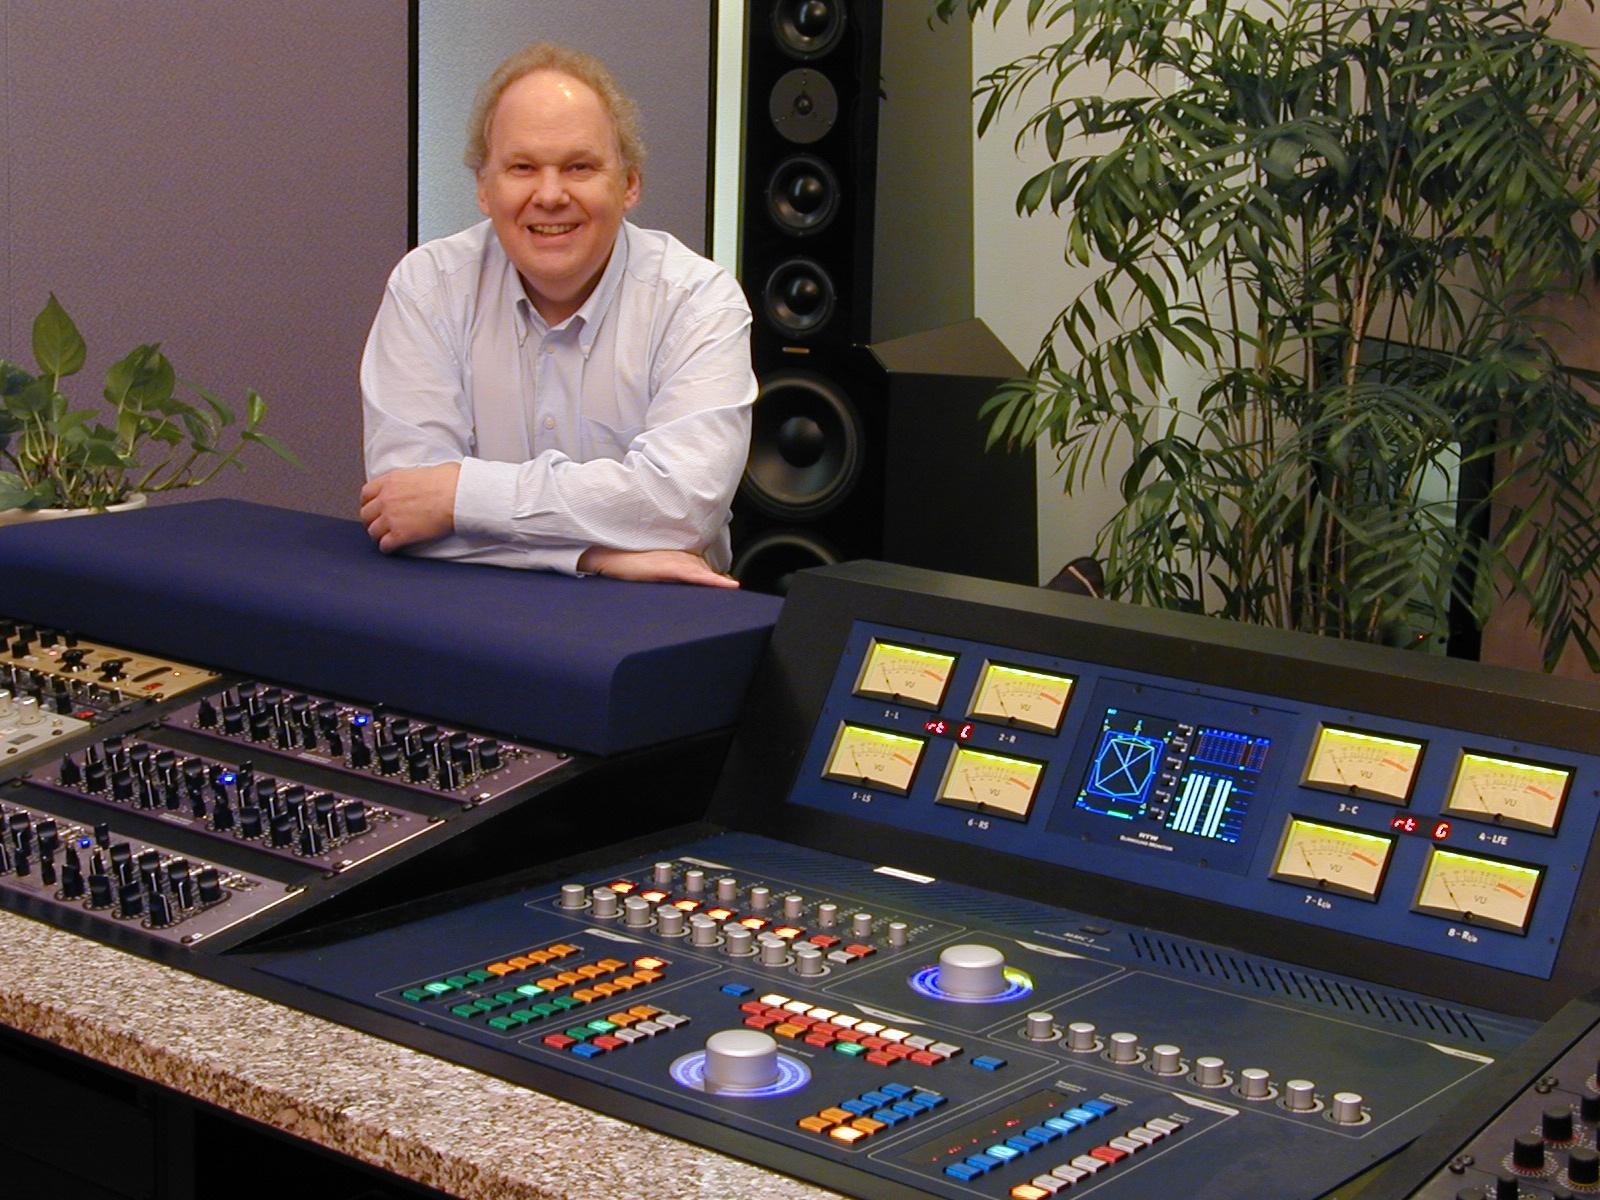 an image of Audio%20Engineer Bob Ludwig